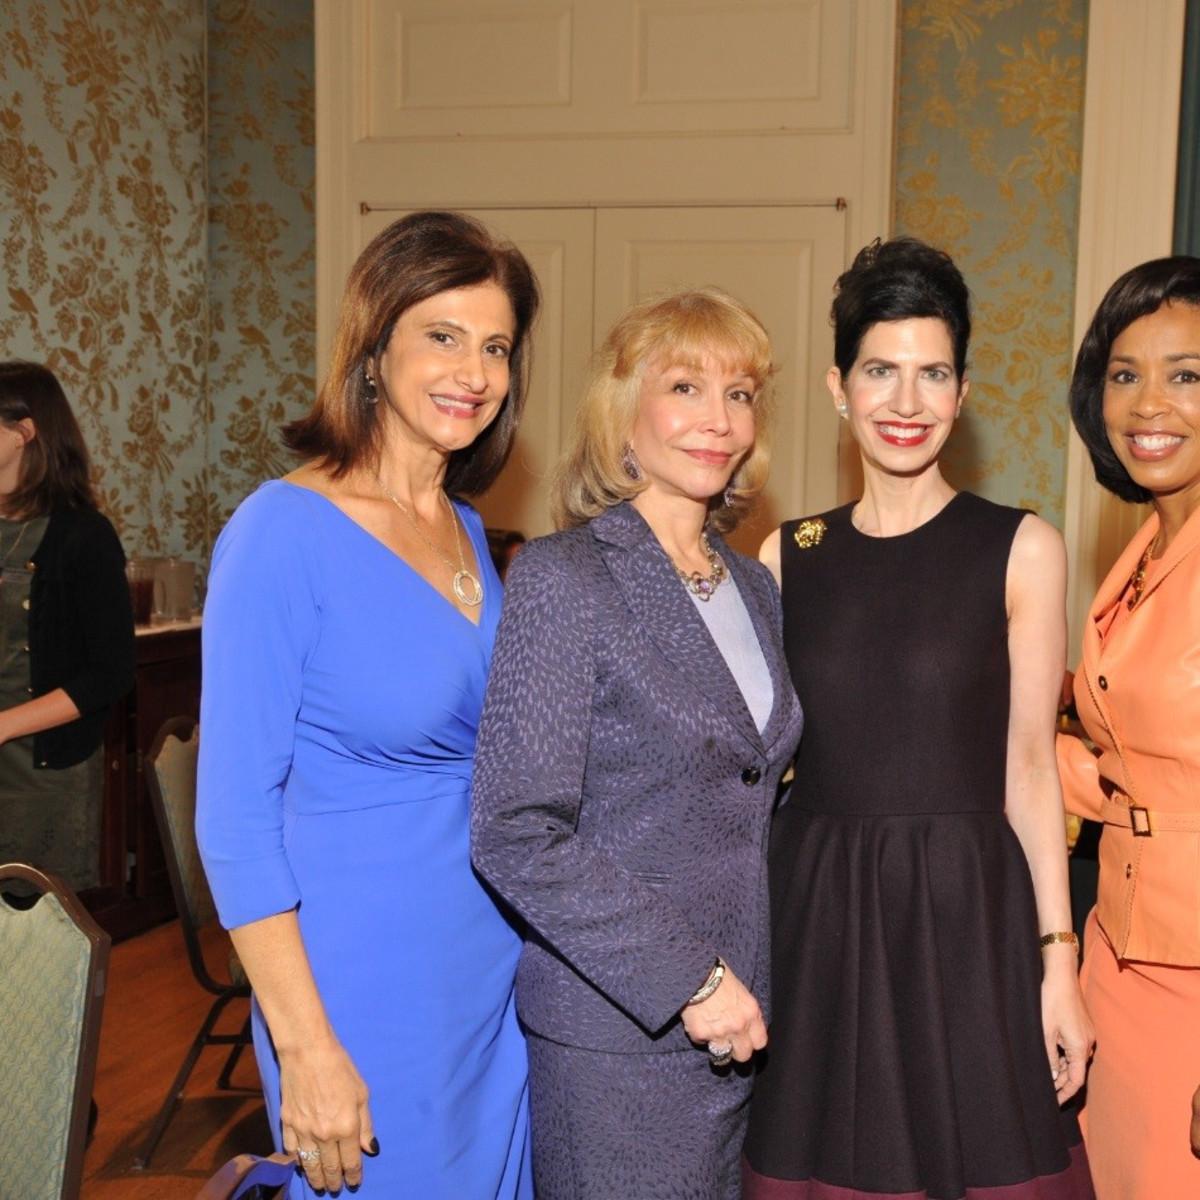 News, Interfaith Ministries luncheon, Nov. 2015, undefinedSouad Bejjani; Susan Boggio, Kelli Cohen Fein, Gina Gaston